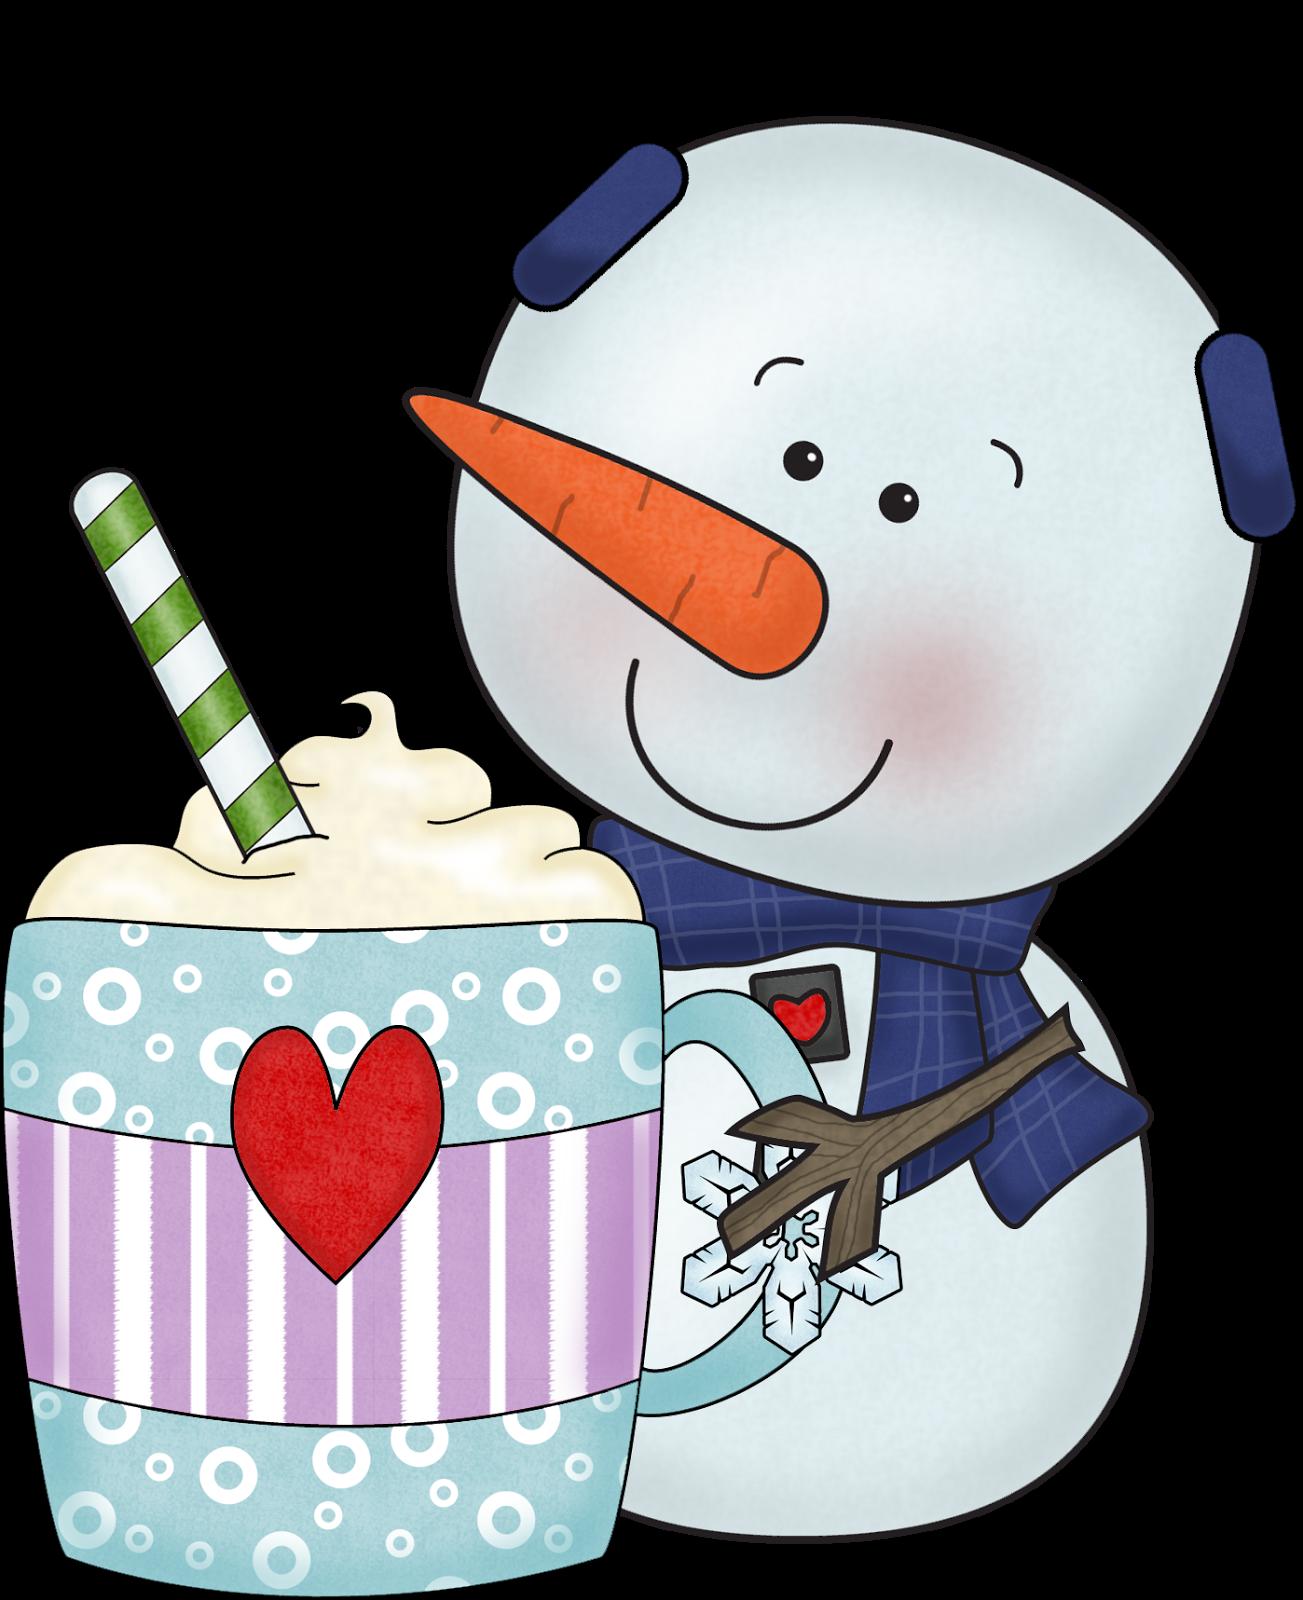 Holiday clipart hot cocoa. Snowman chocolate clip arts